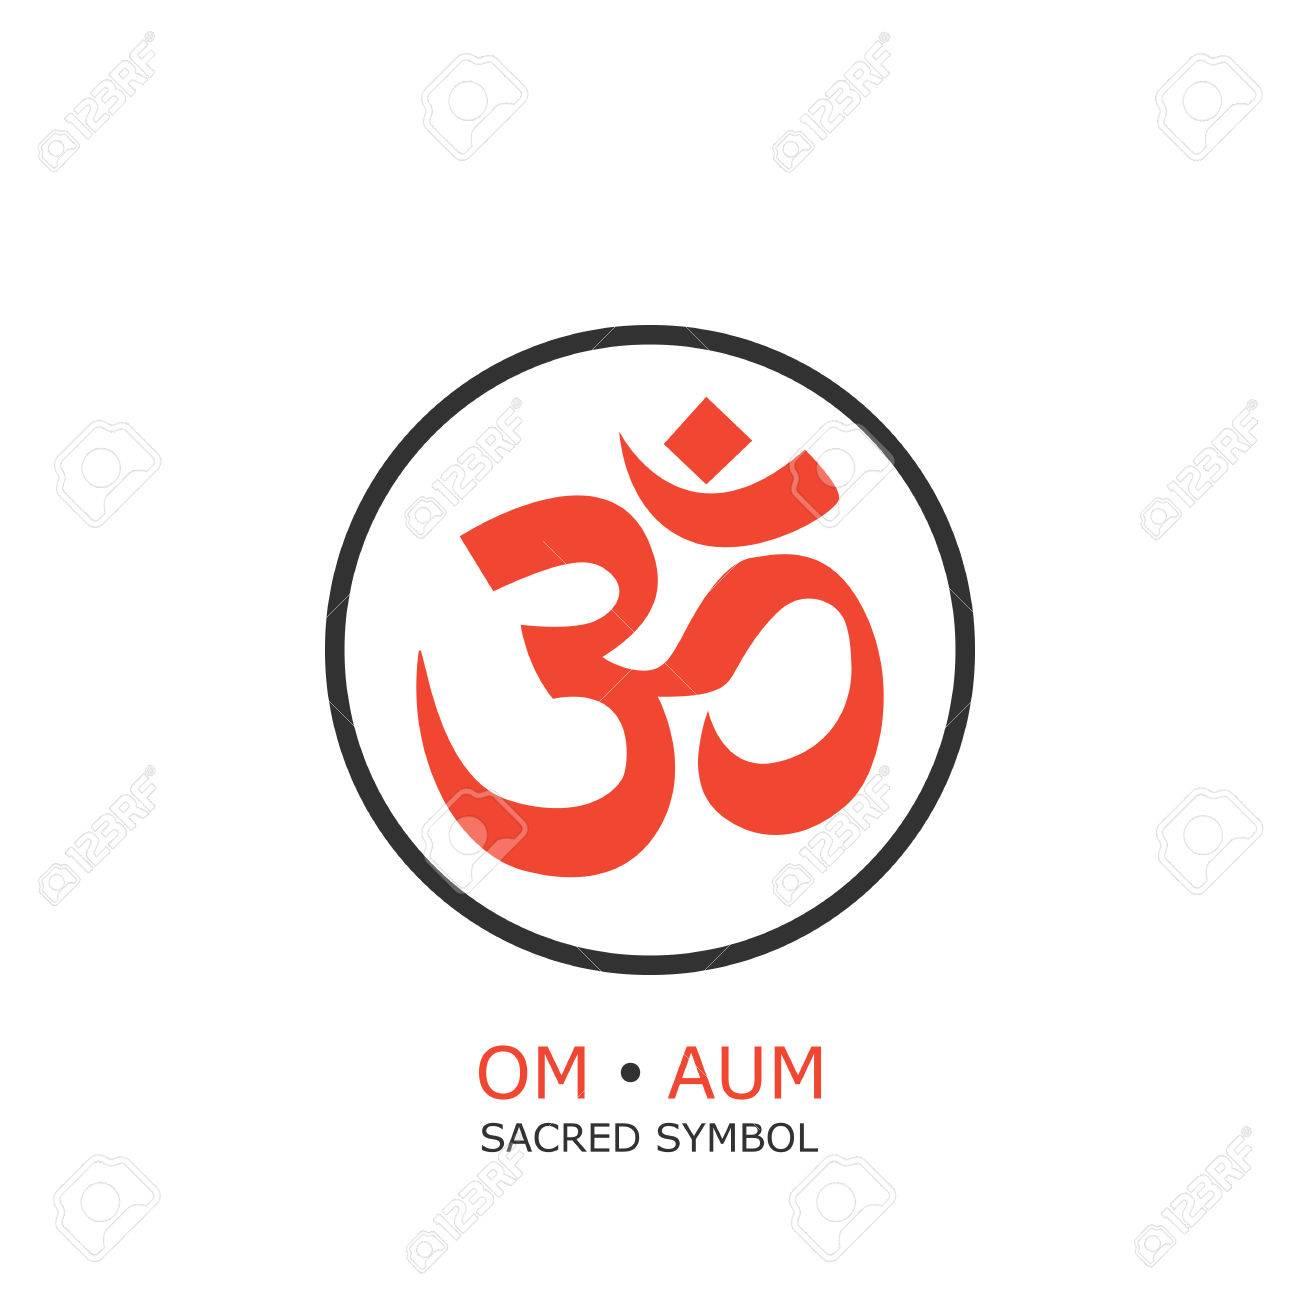 Om Symbol Aum Sign Isolated On White Background